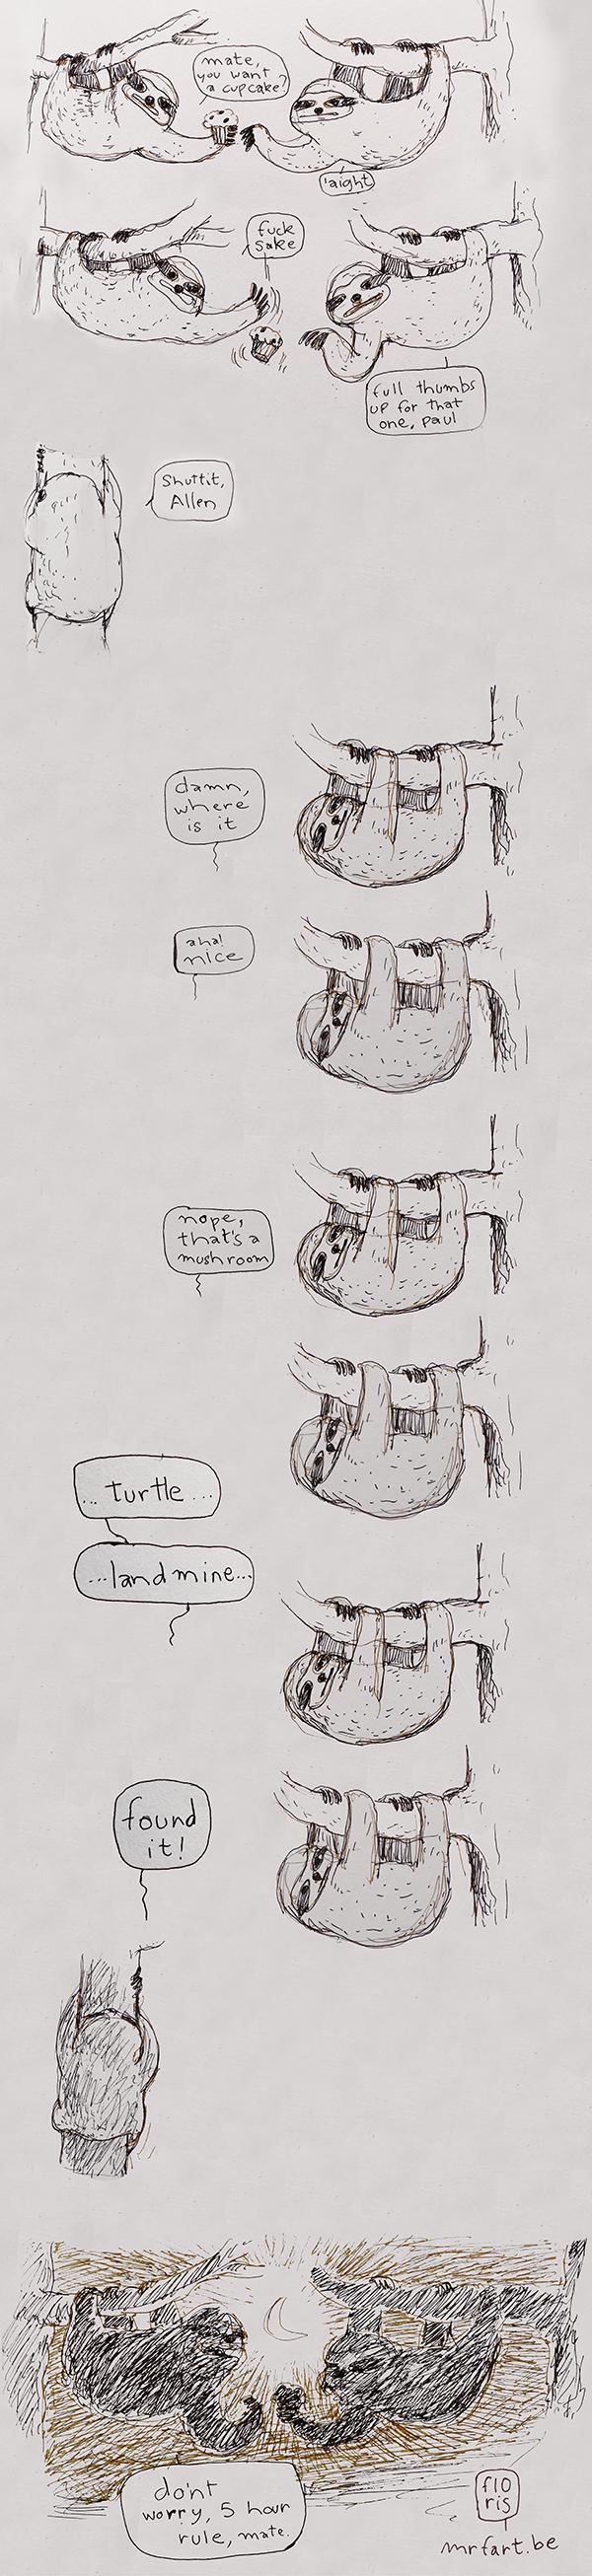 Sloths rules